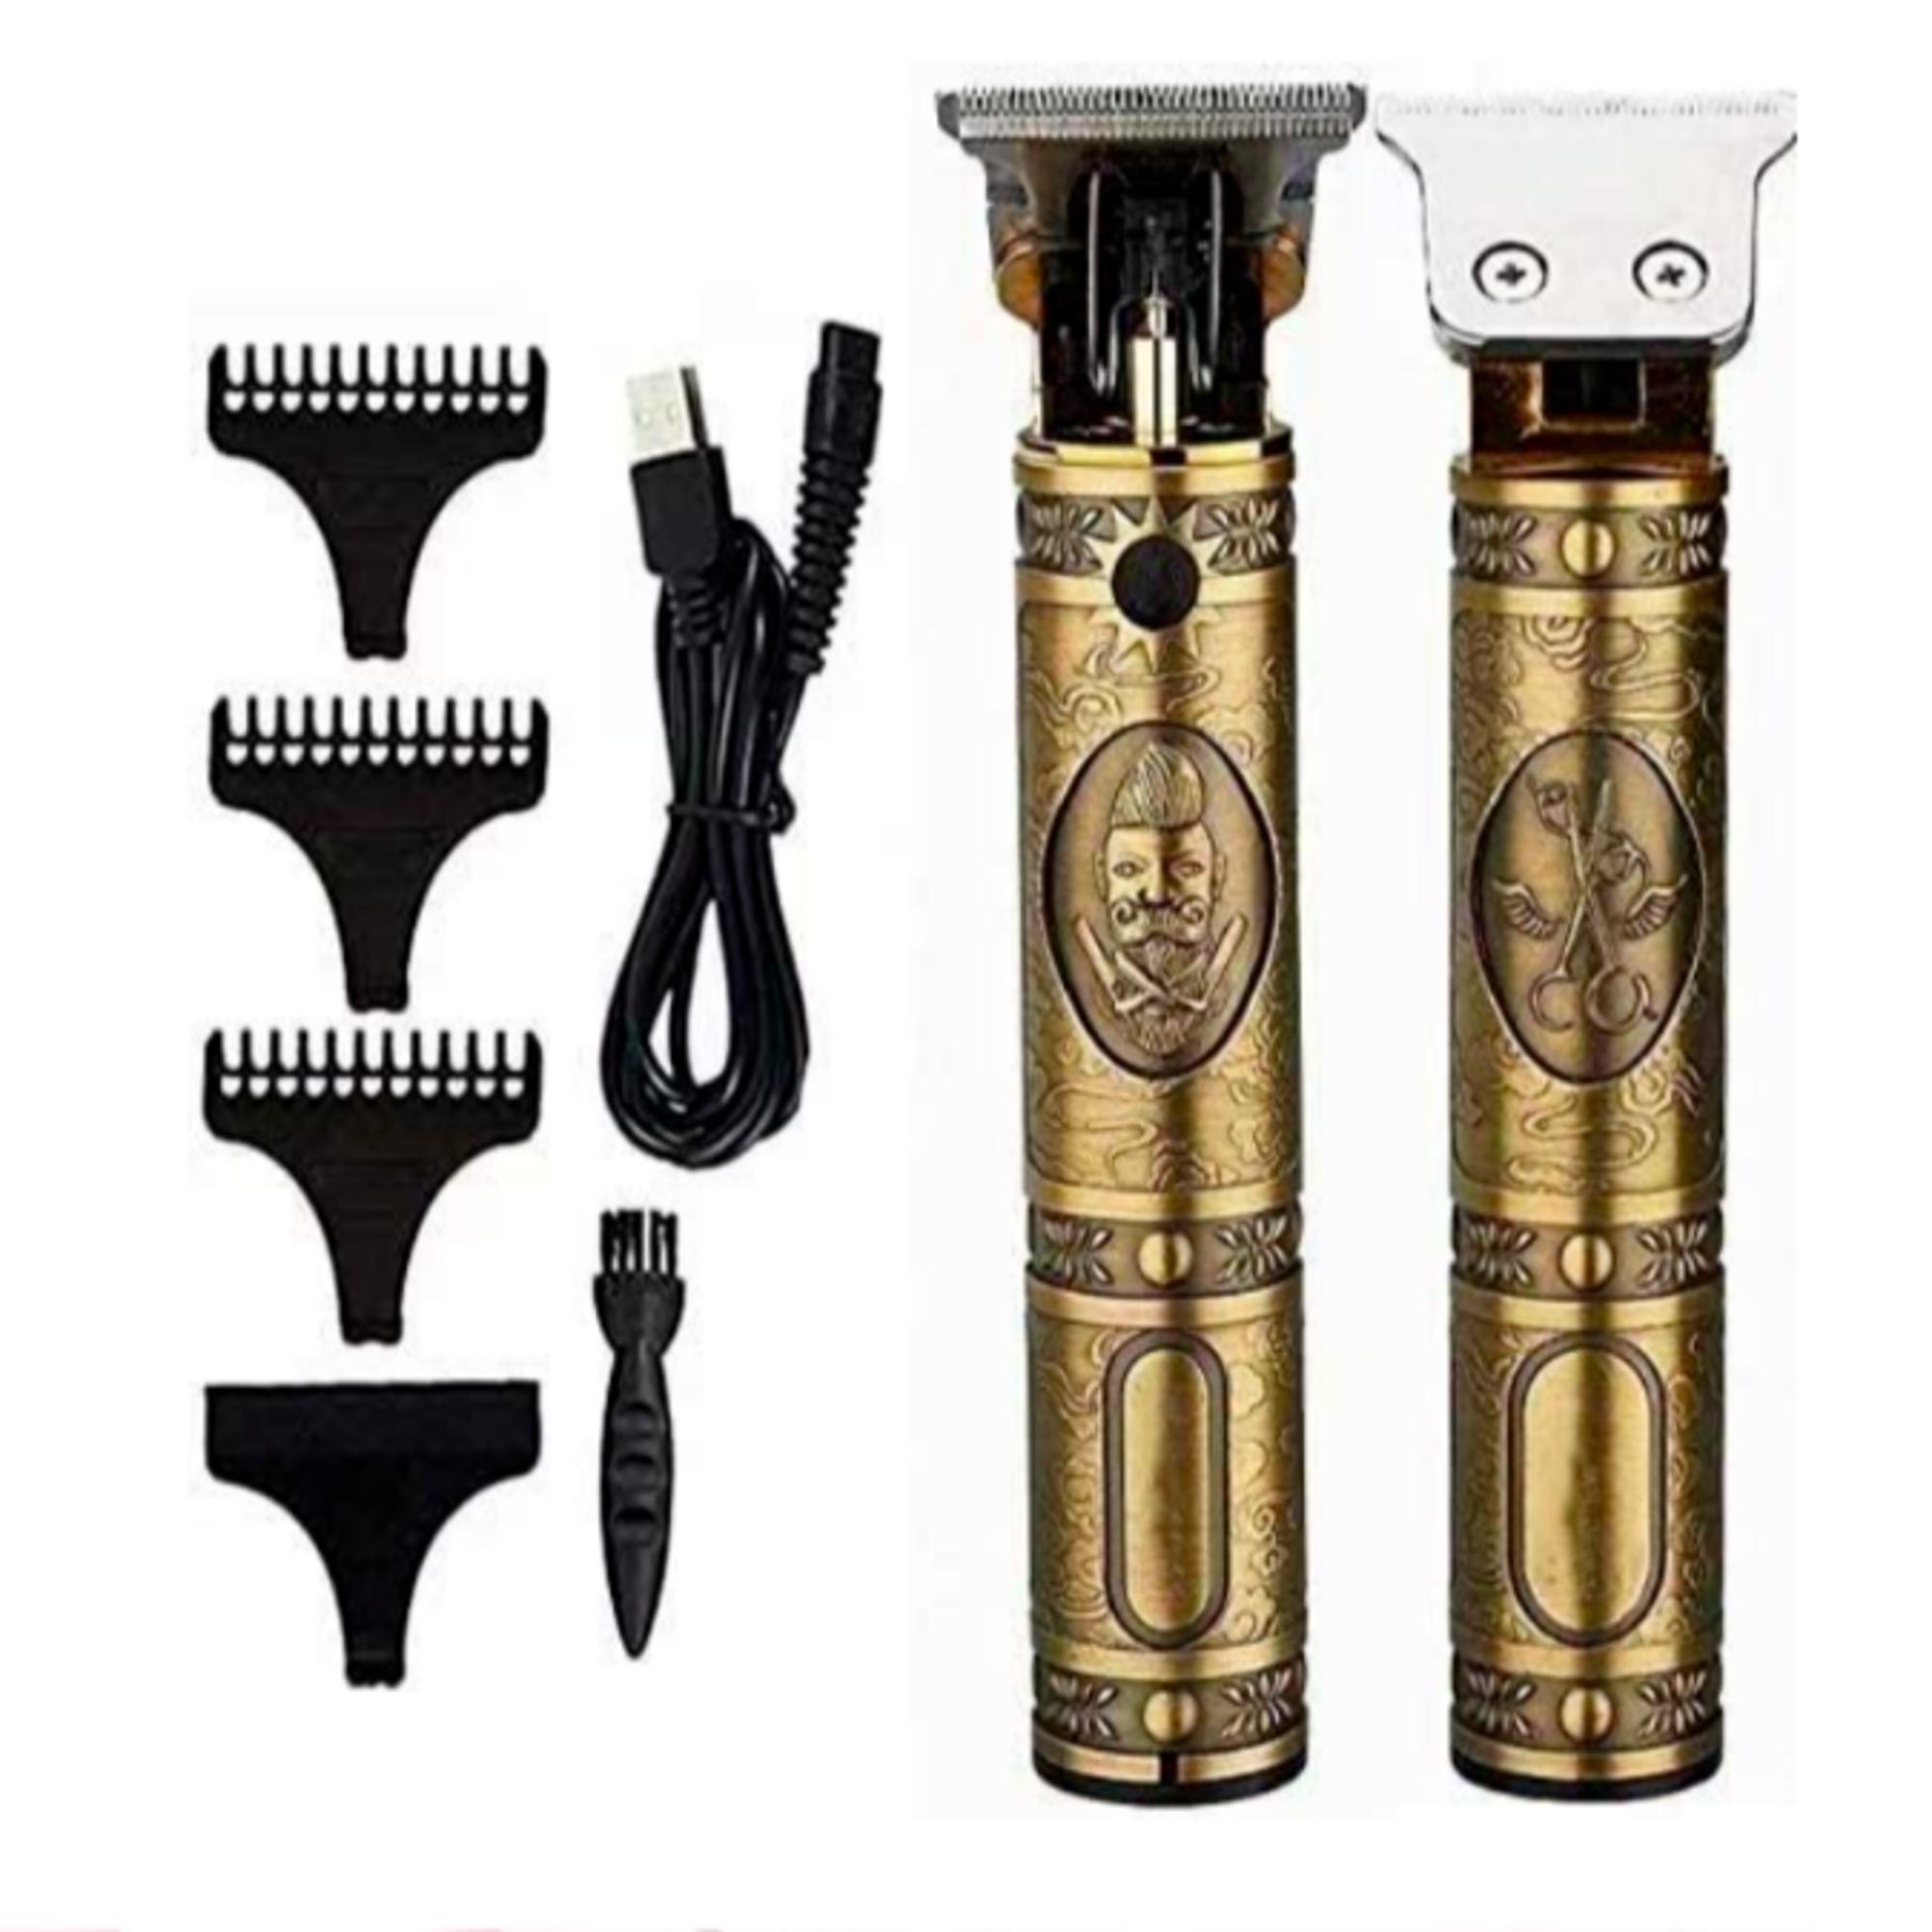 Триммер для стрижки волос, бороды и усов Shinon SH2559 оптом